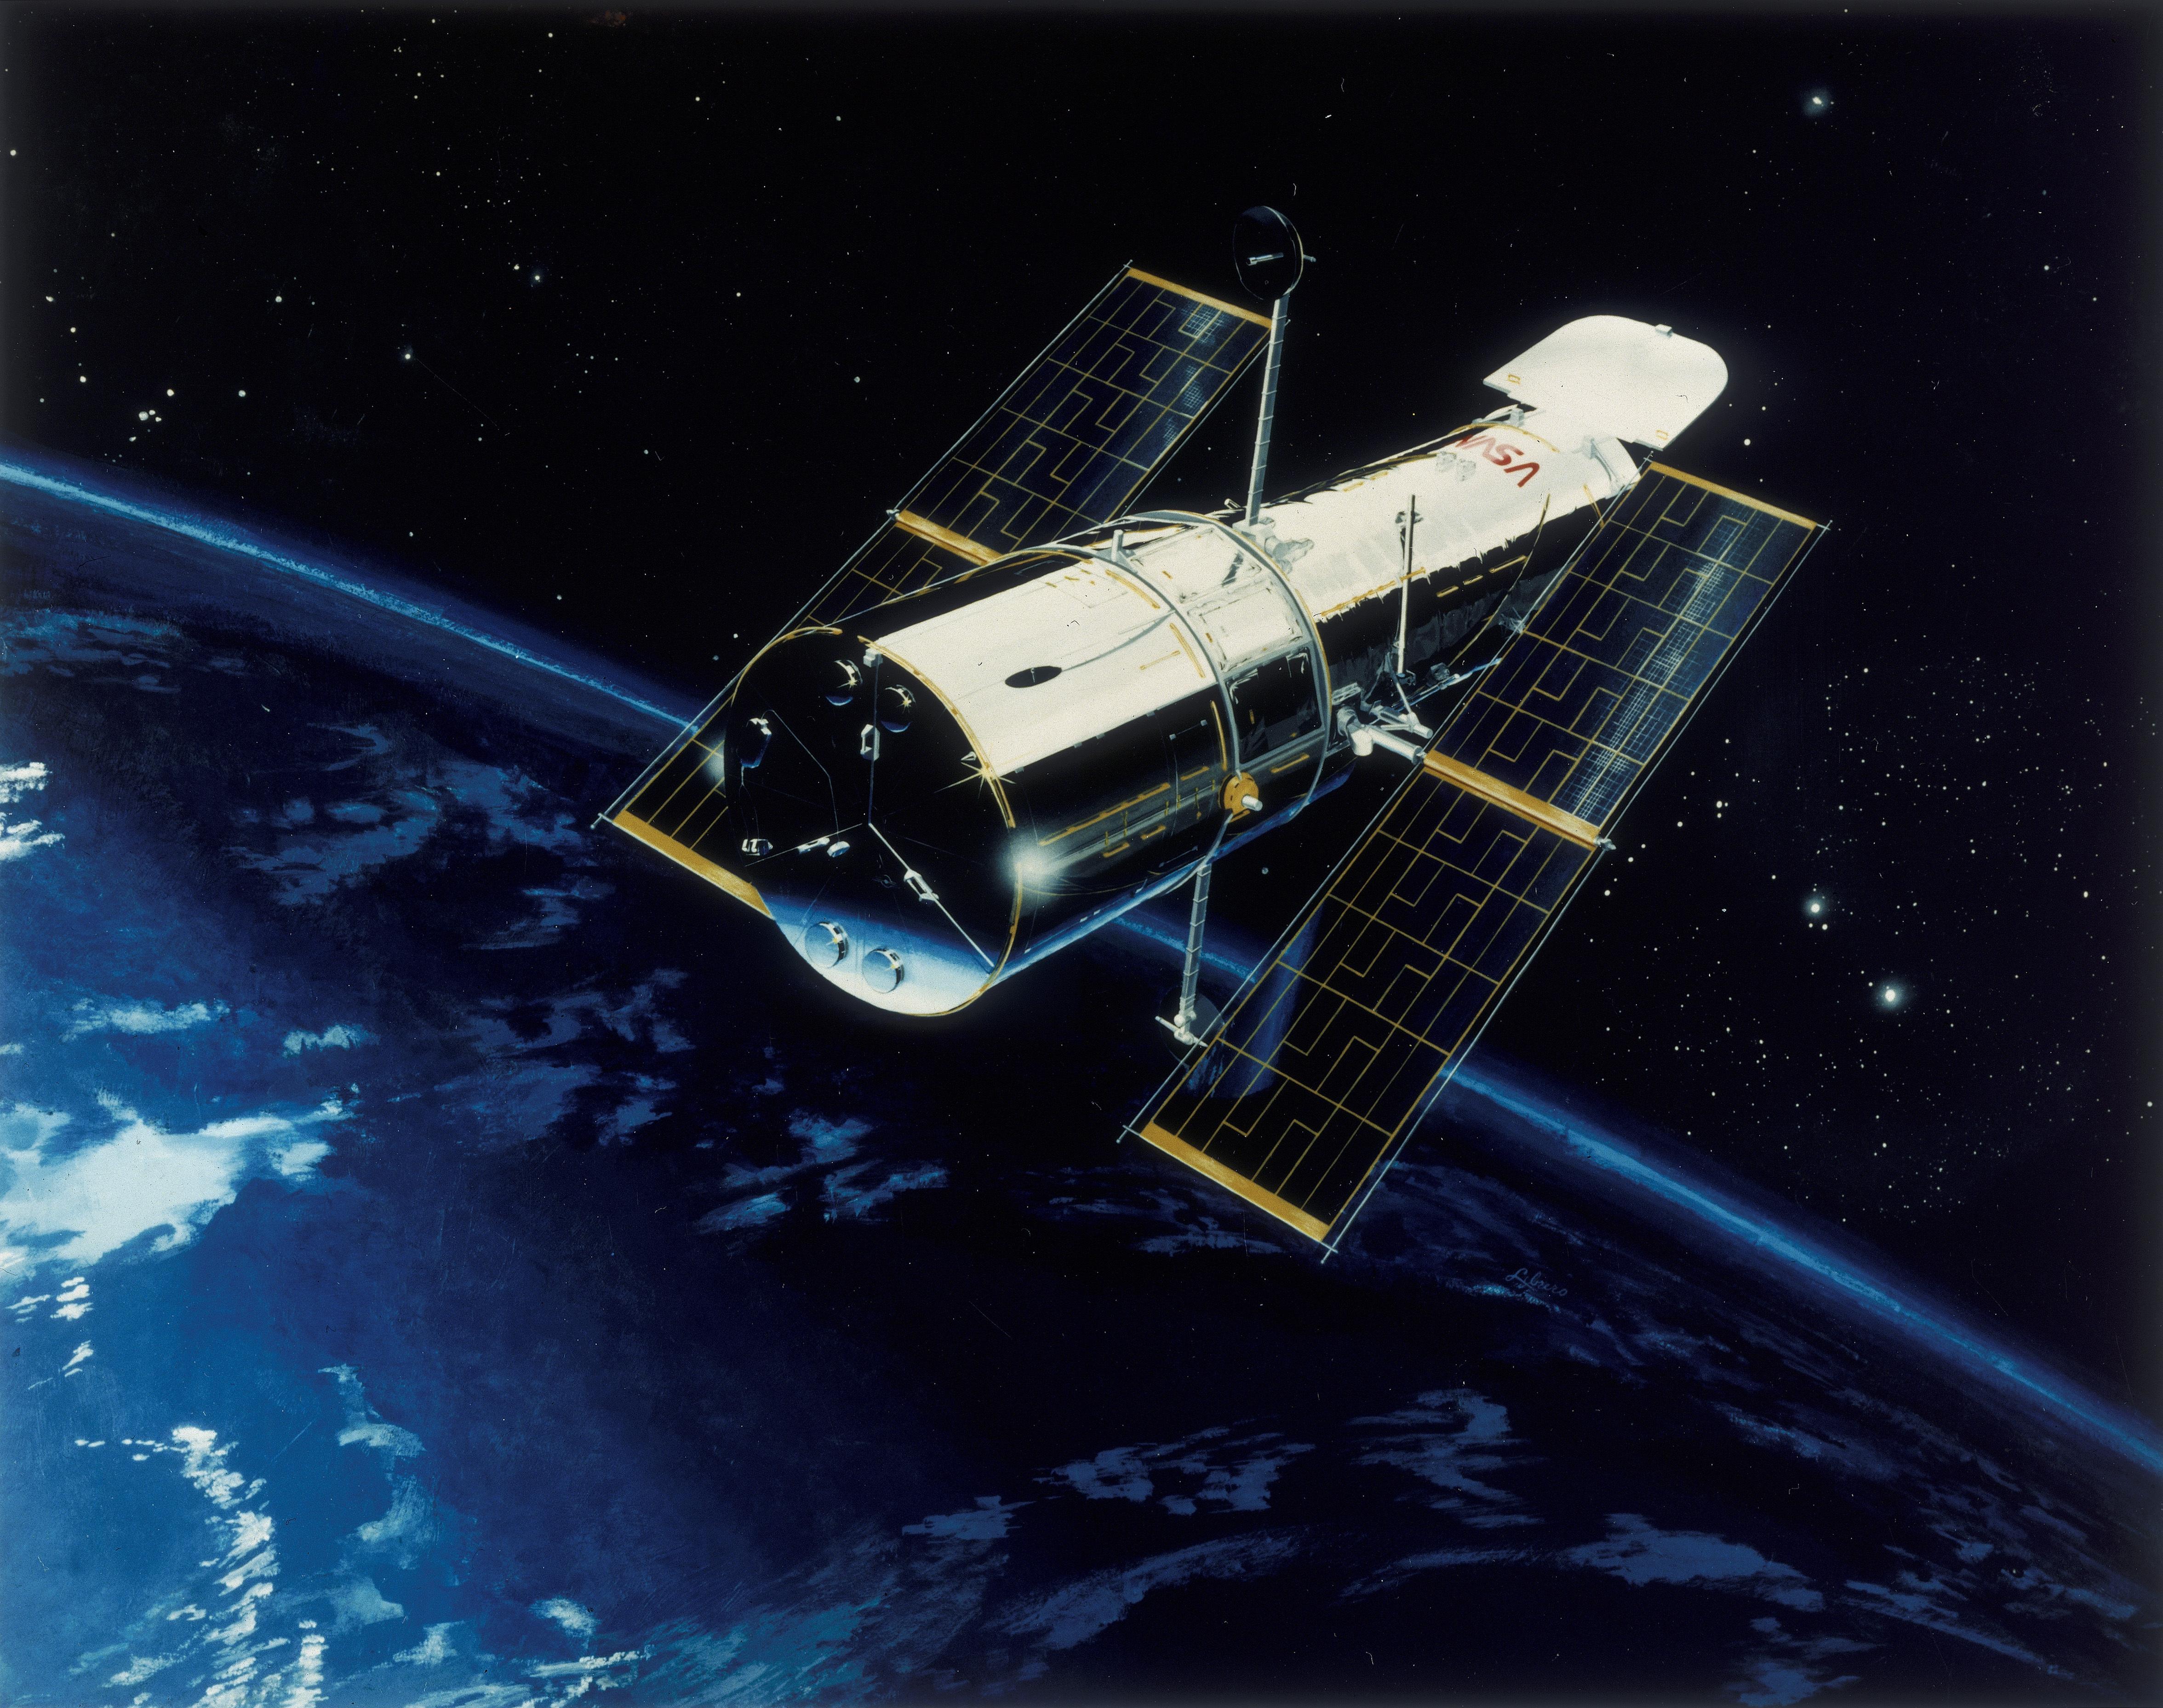 nasa building the hubble space telescope - HD4704×3714